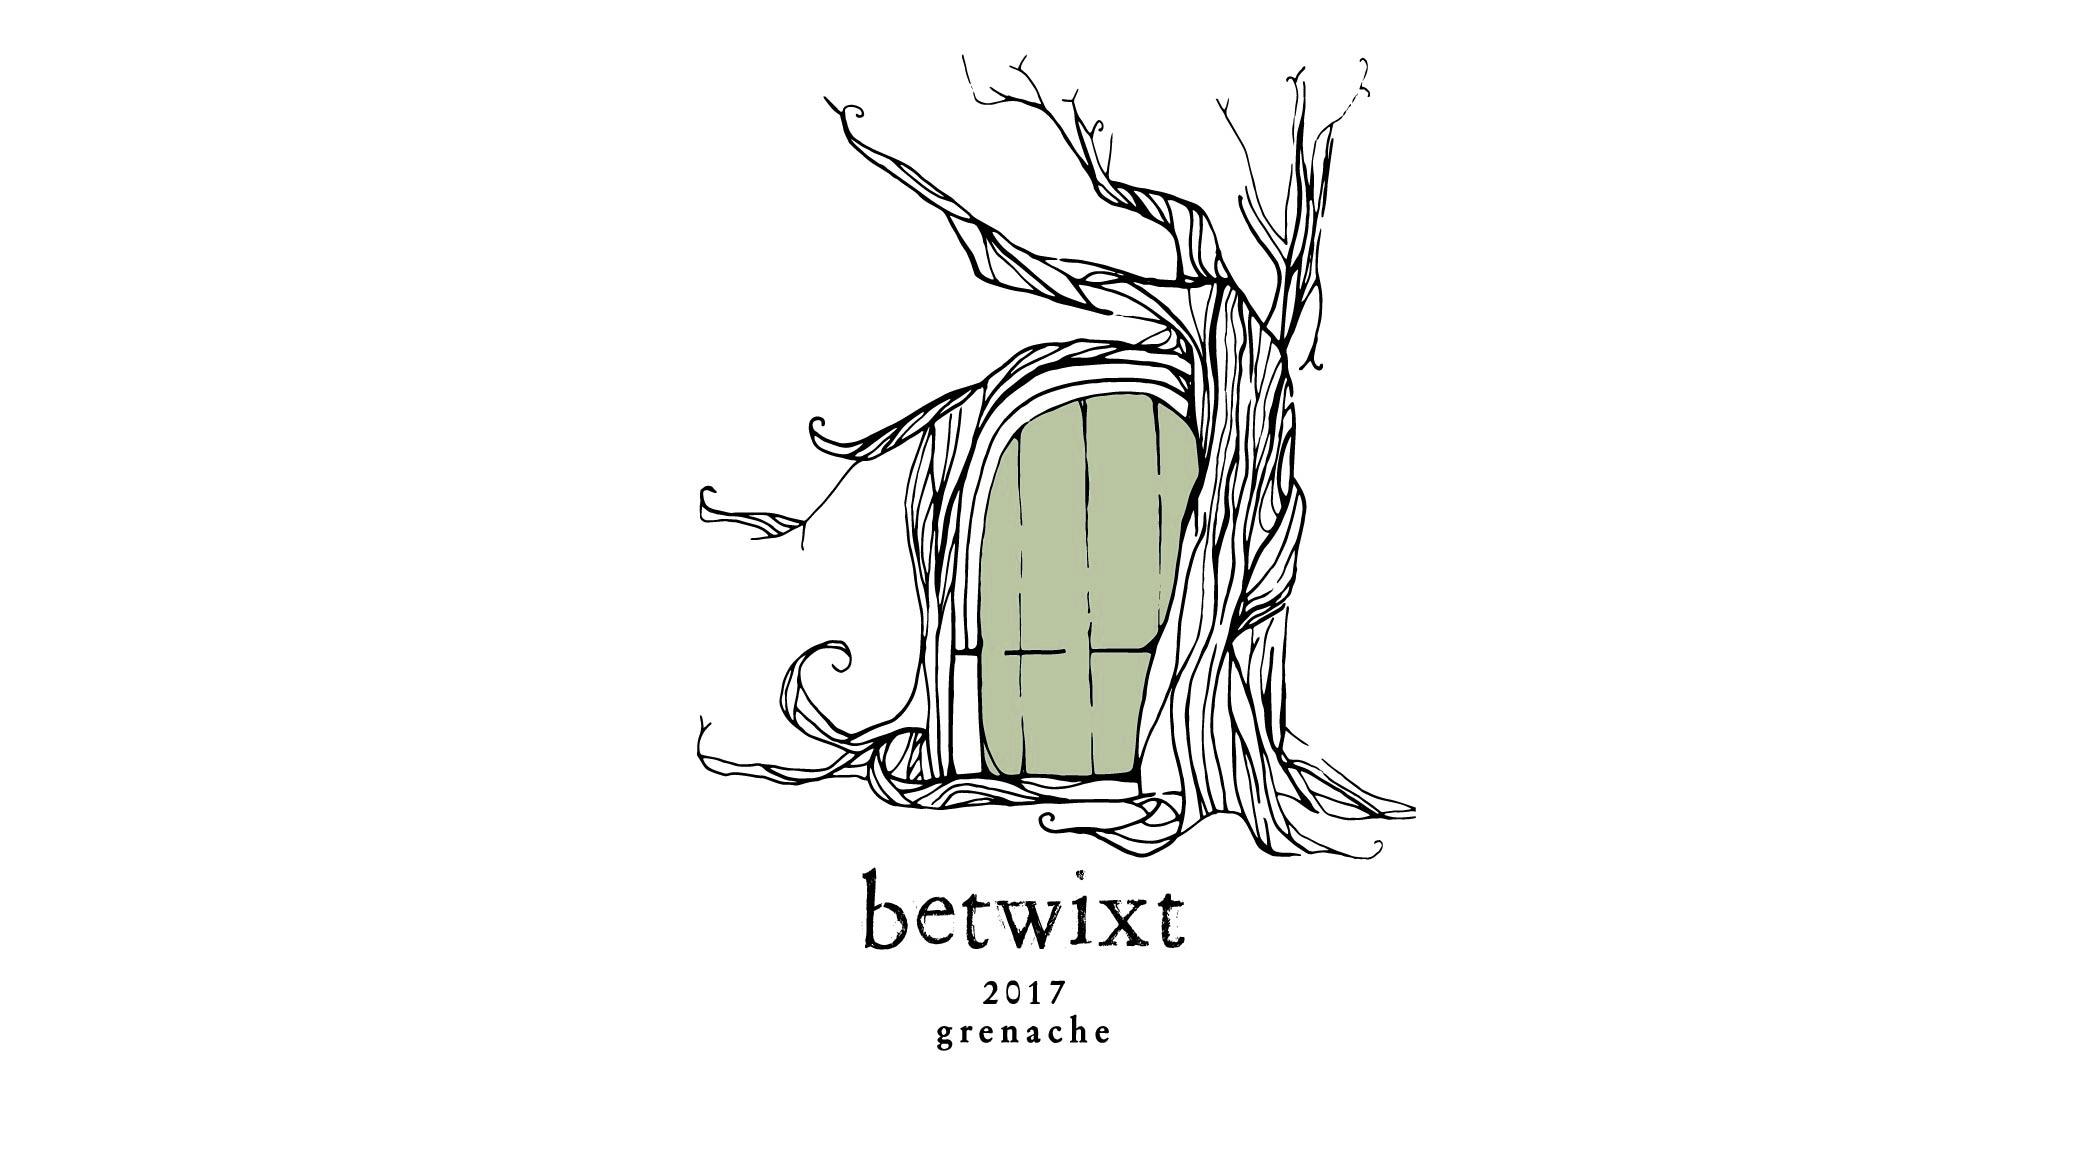 betwixt_abba_grenache_2017_whitebackground